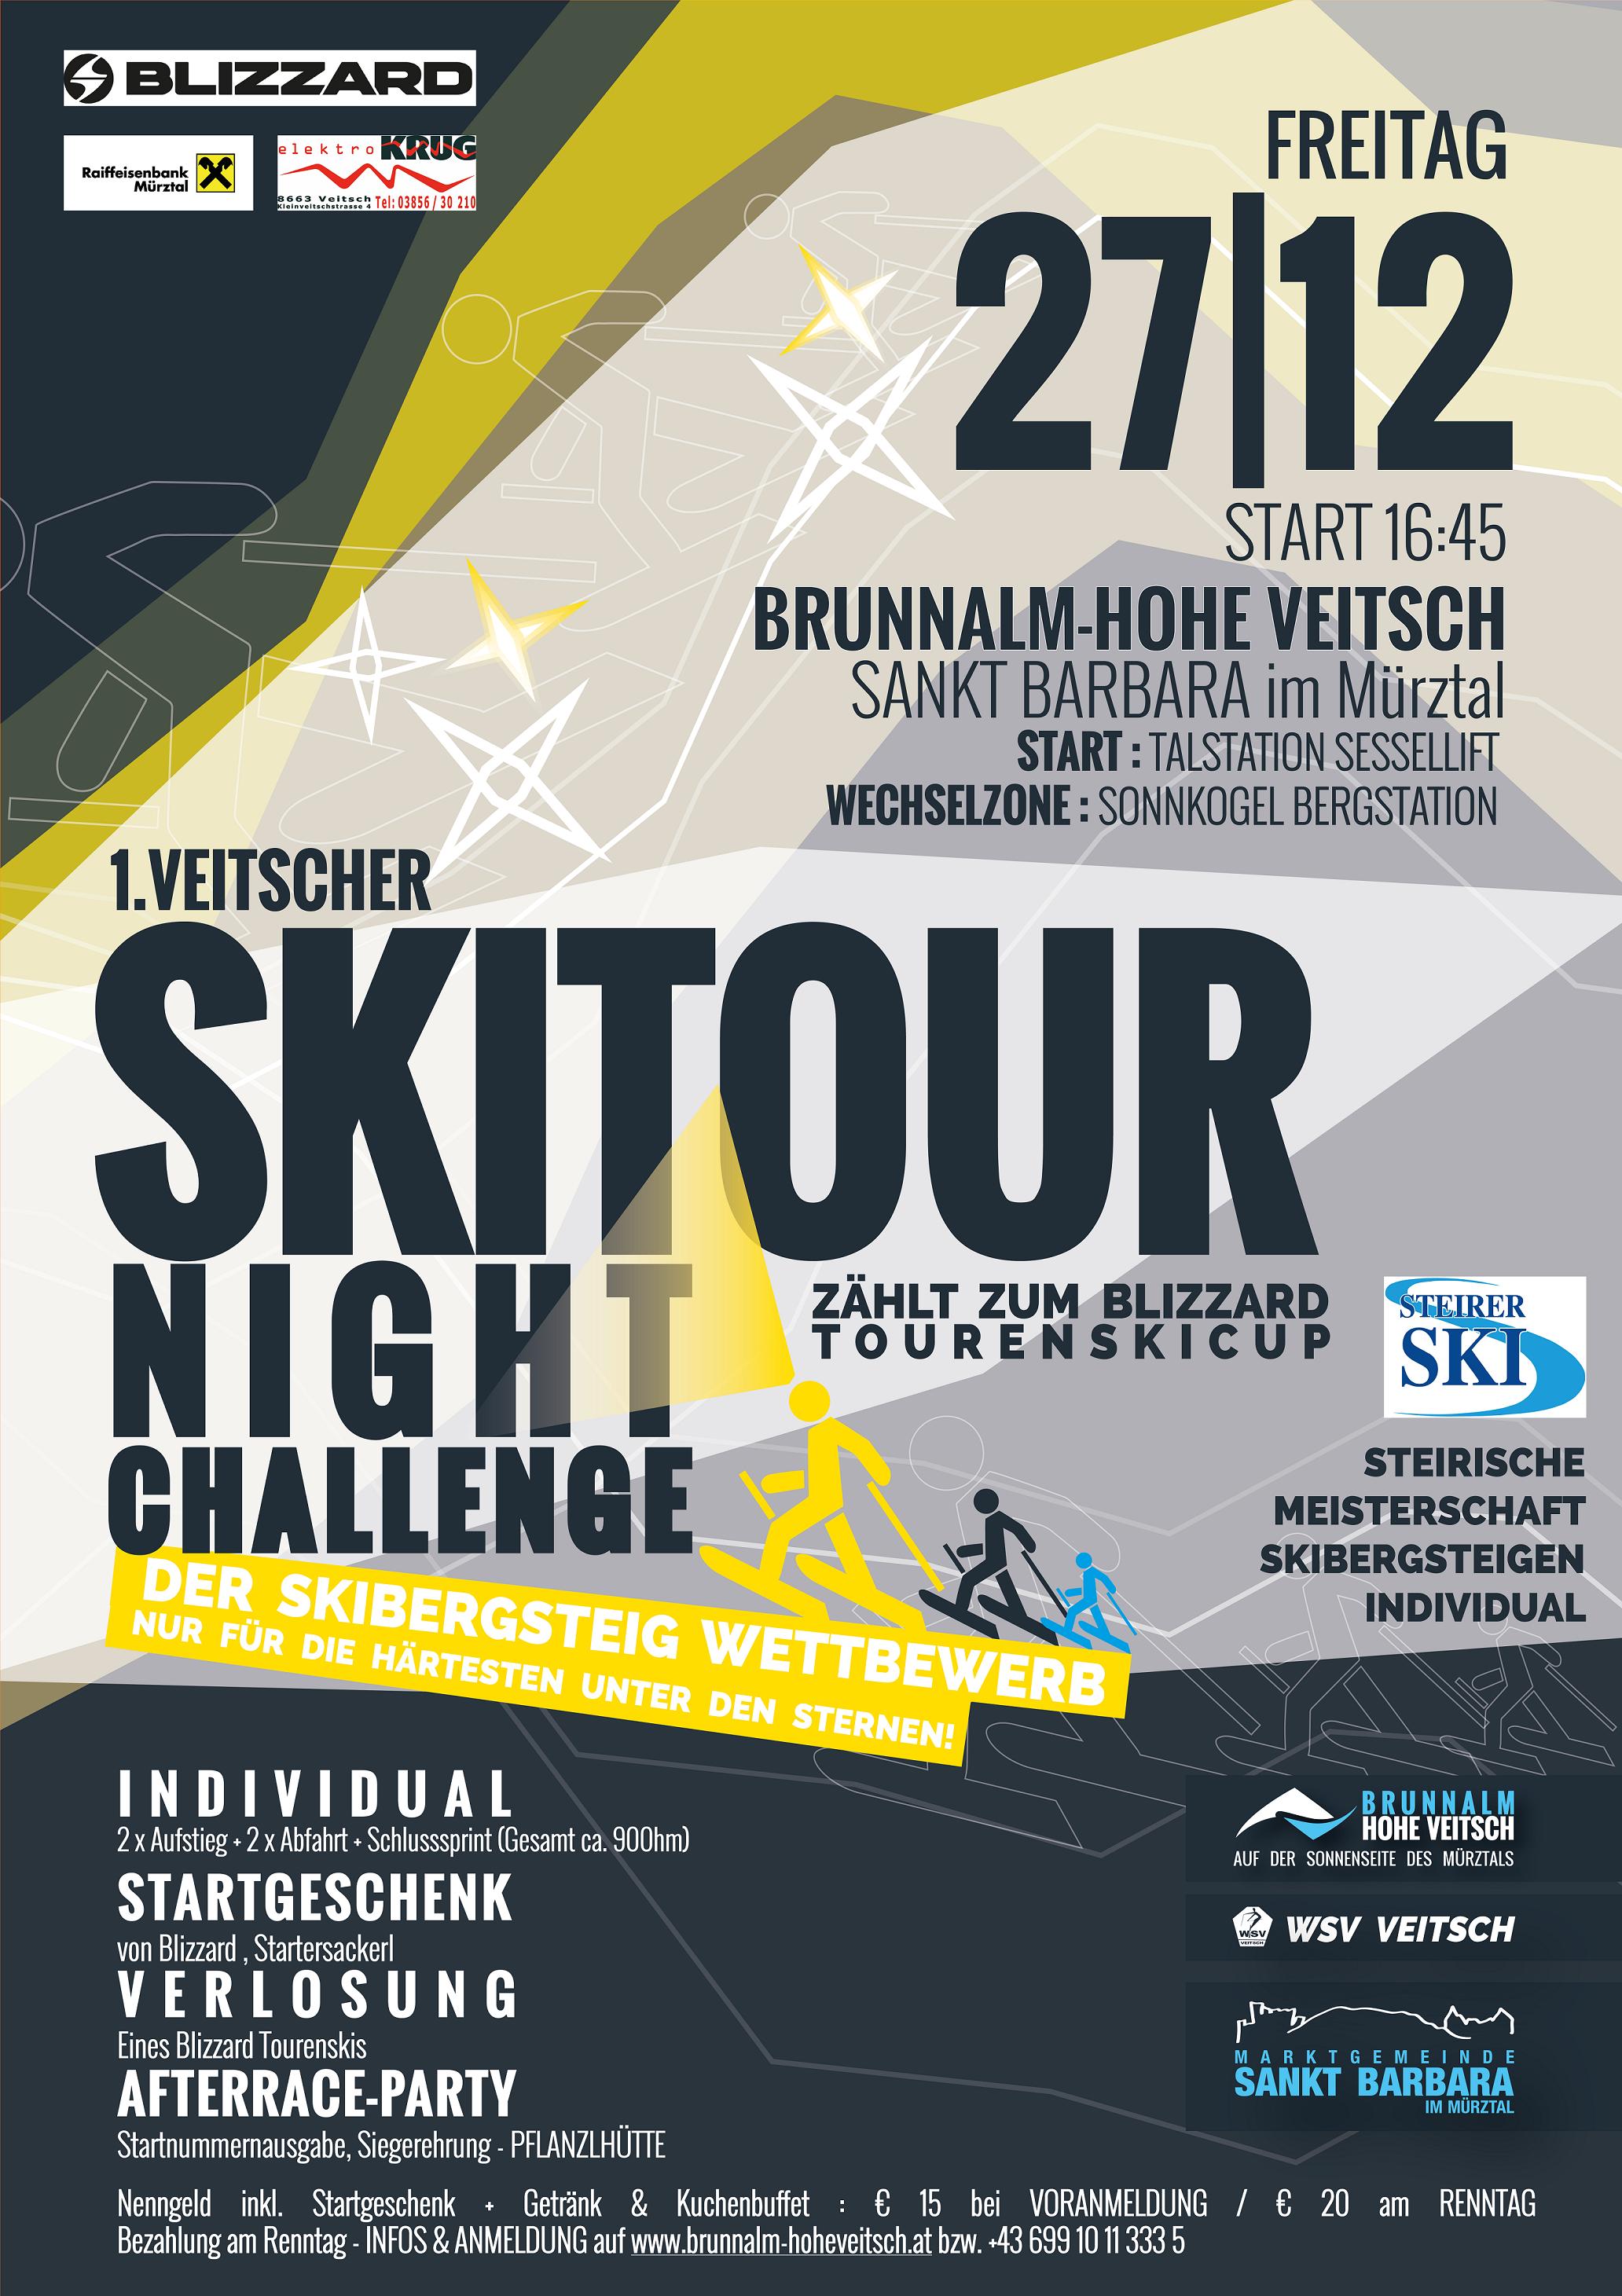 191104 PLAKAT skitournightchallenge 01